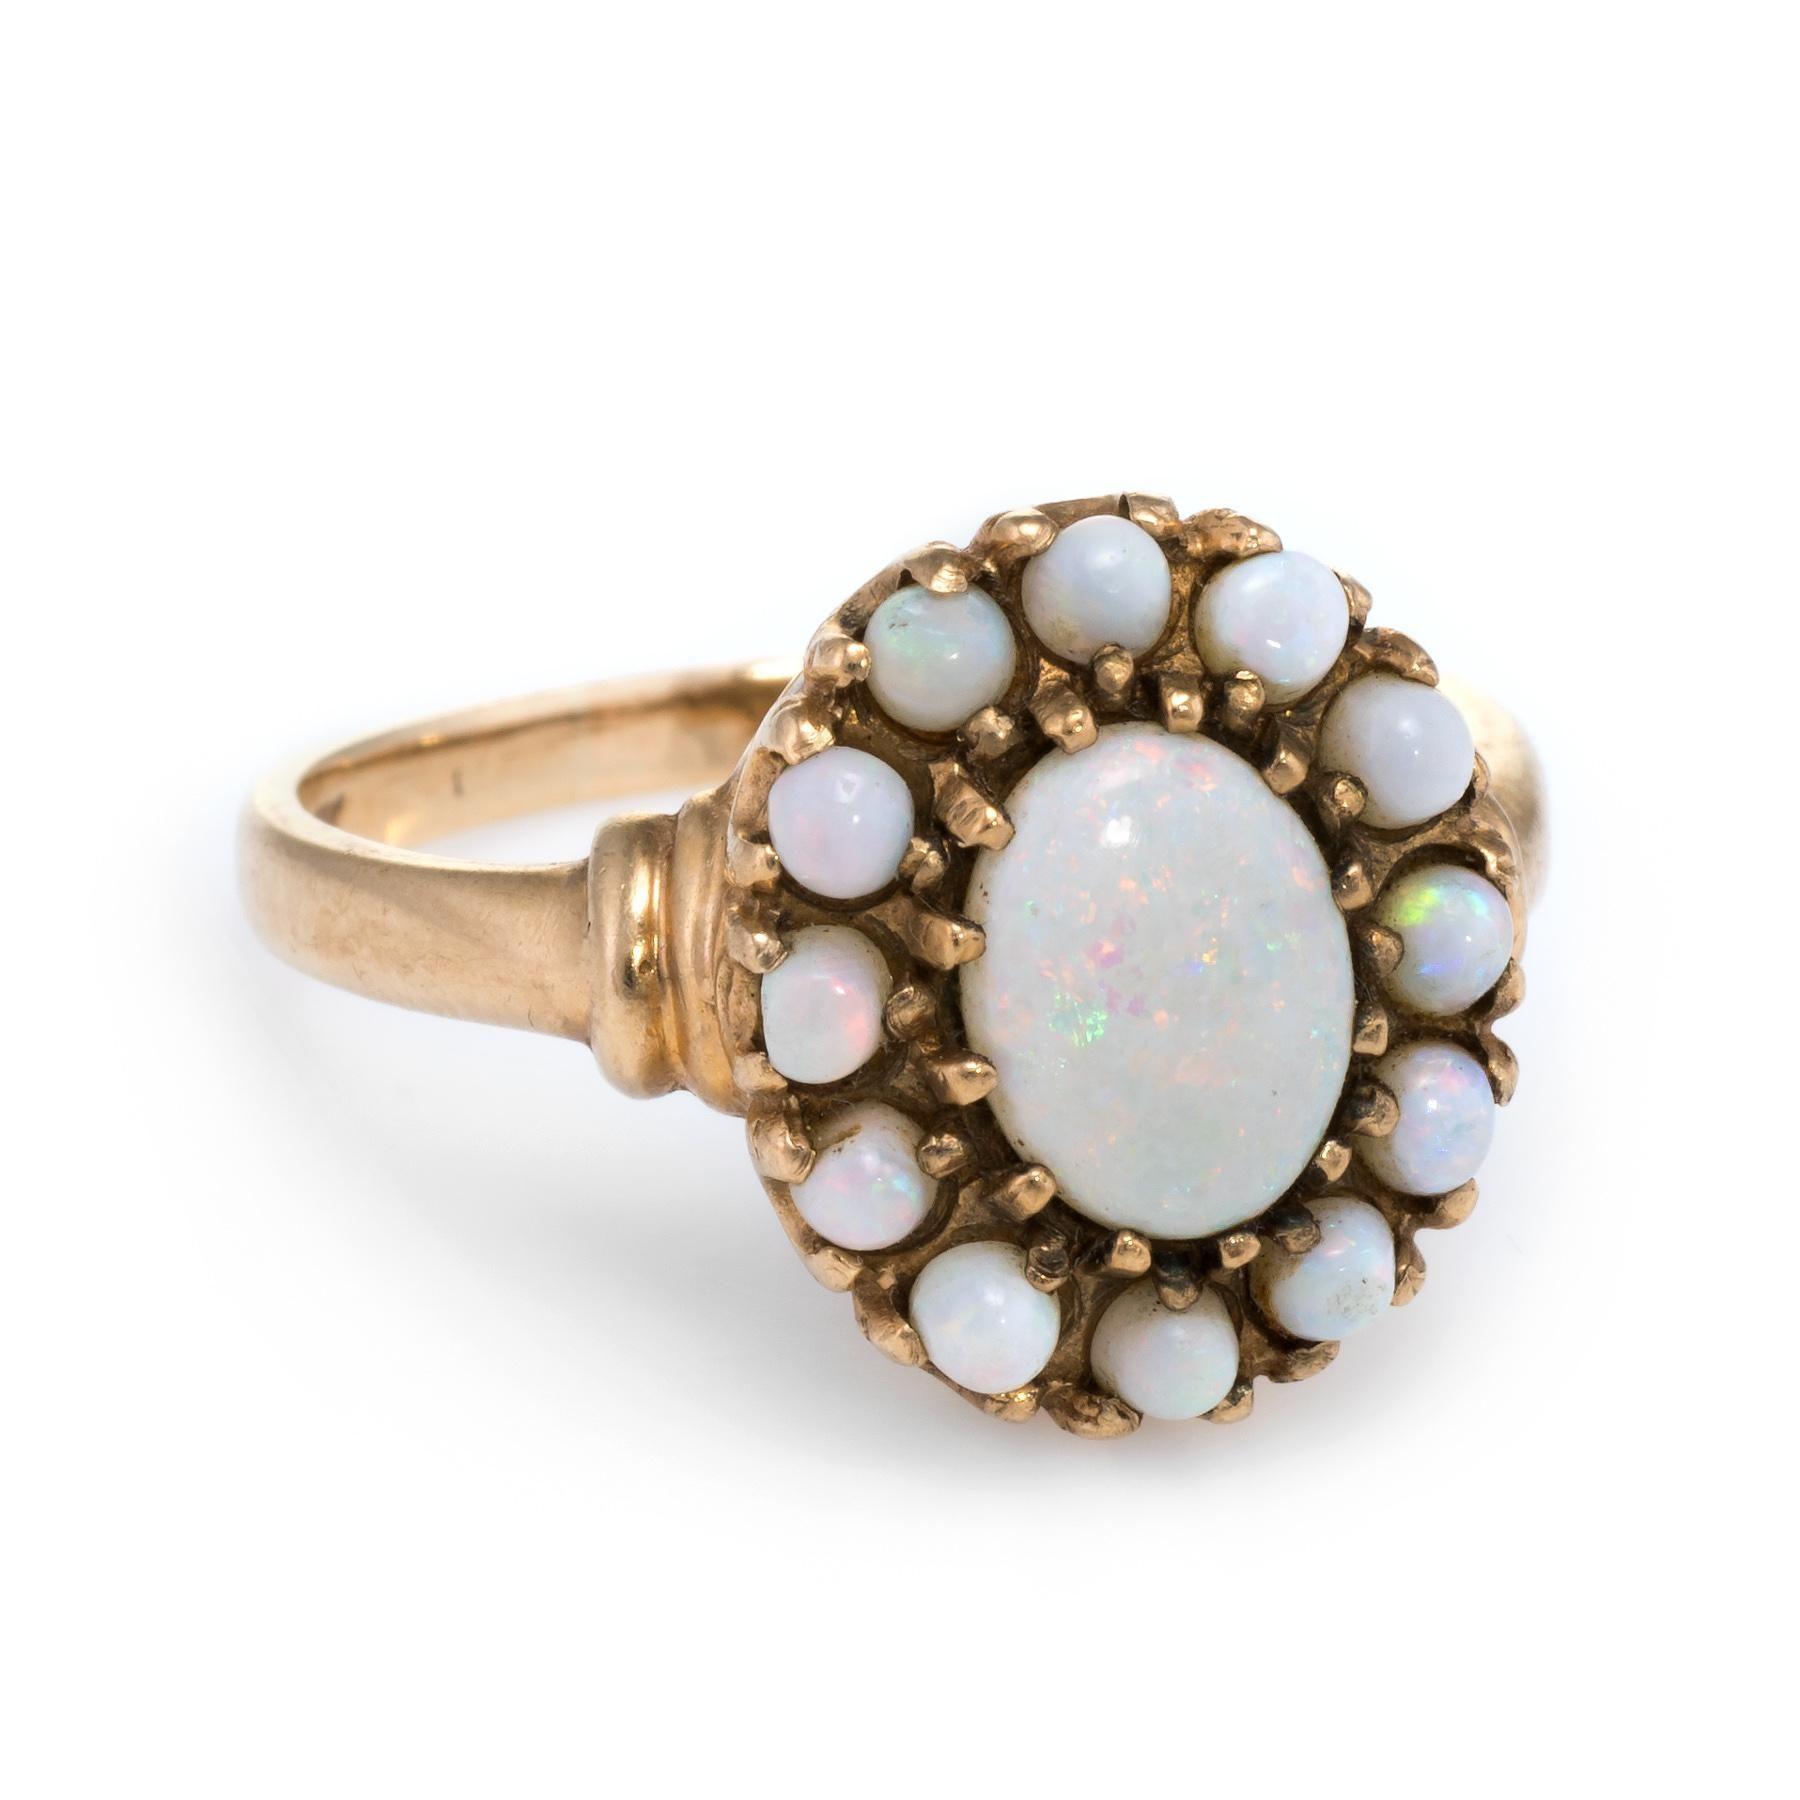 Opal Princess Ring Vintage 10k Yellow Gold Estate Fine Jewelry Pre